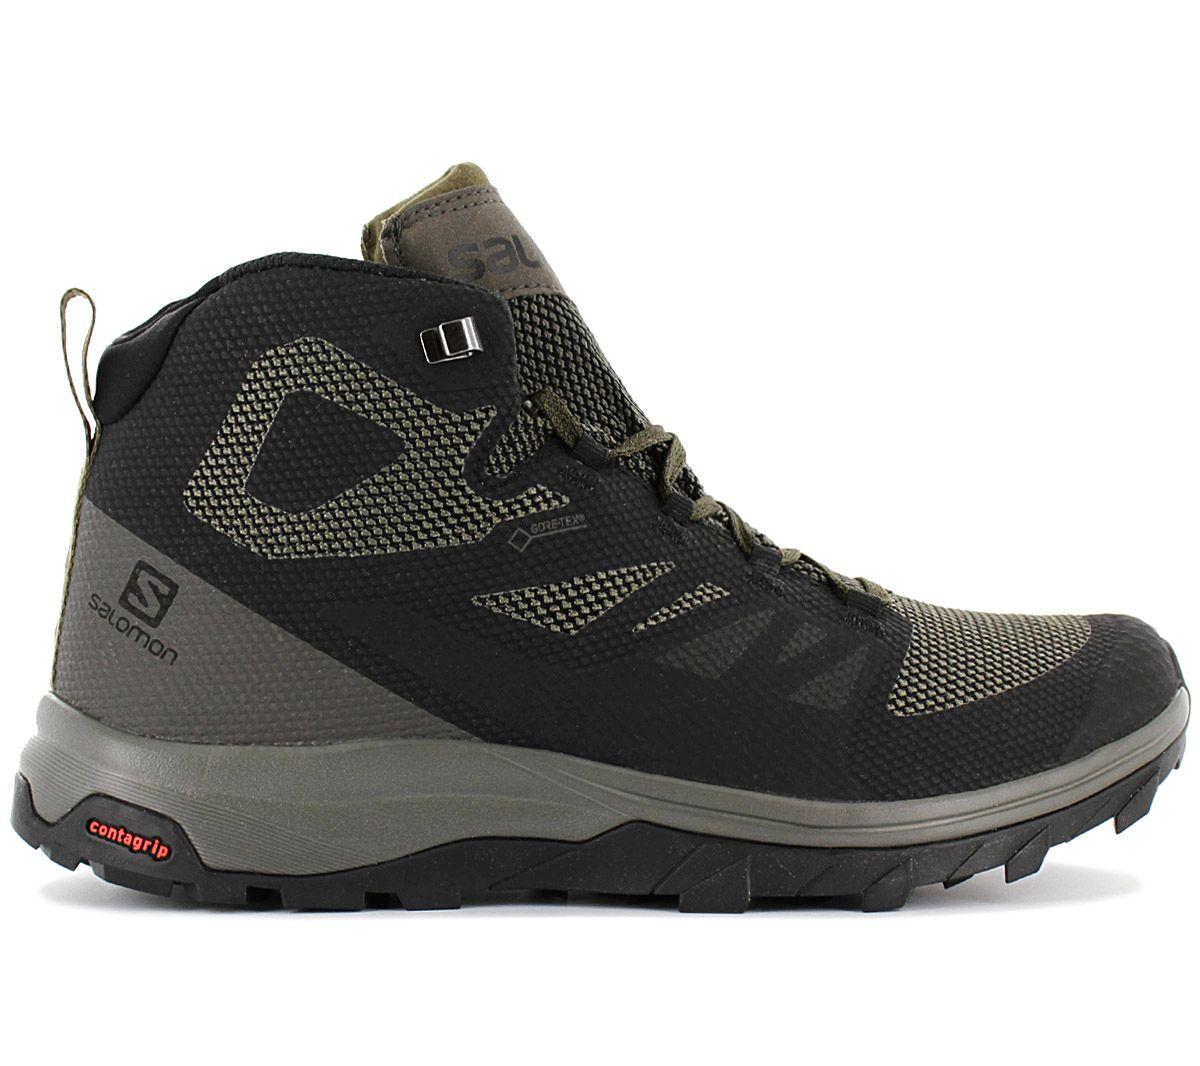 Bisagra Fracaso haz  Salomon Outline mid gtx - gore-tex - 404763 Men's Hiking Shoes Outdoor  Shoes | eBay